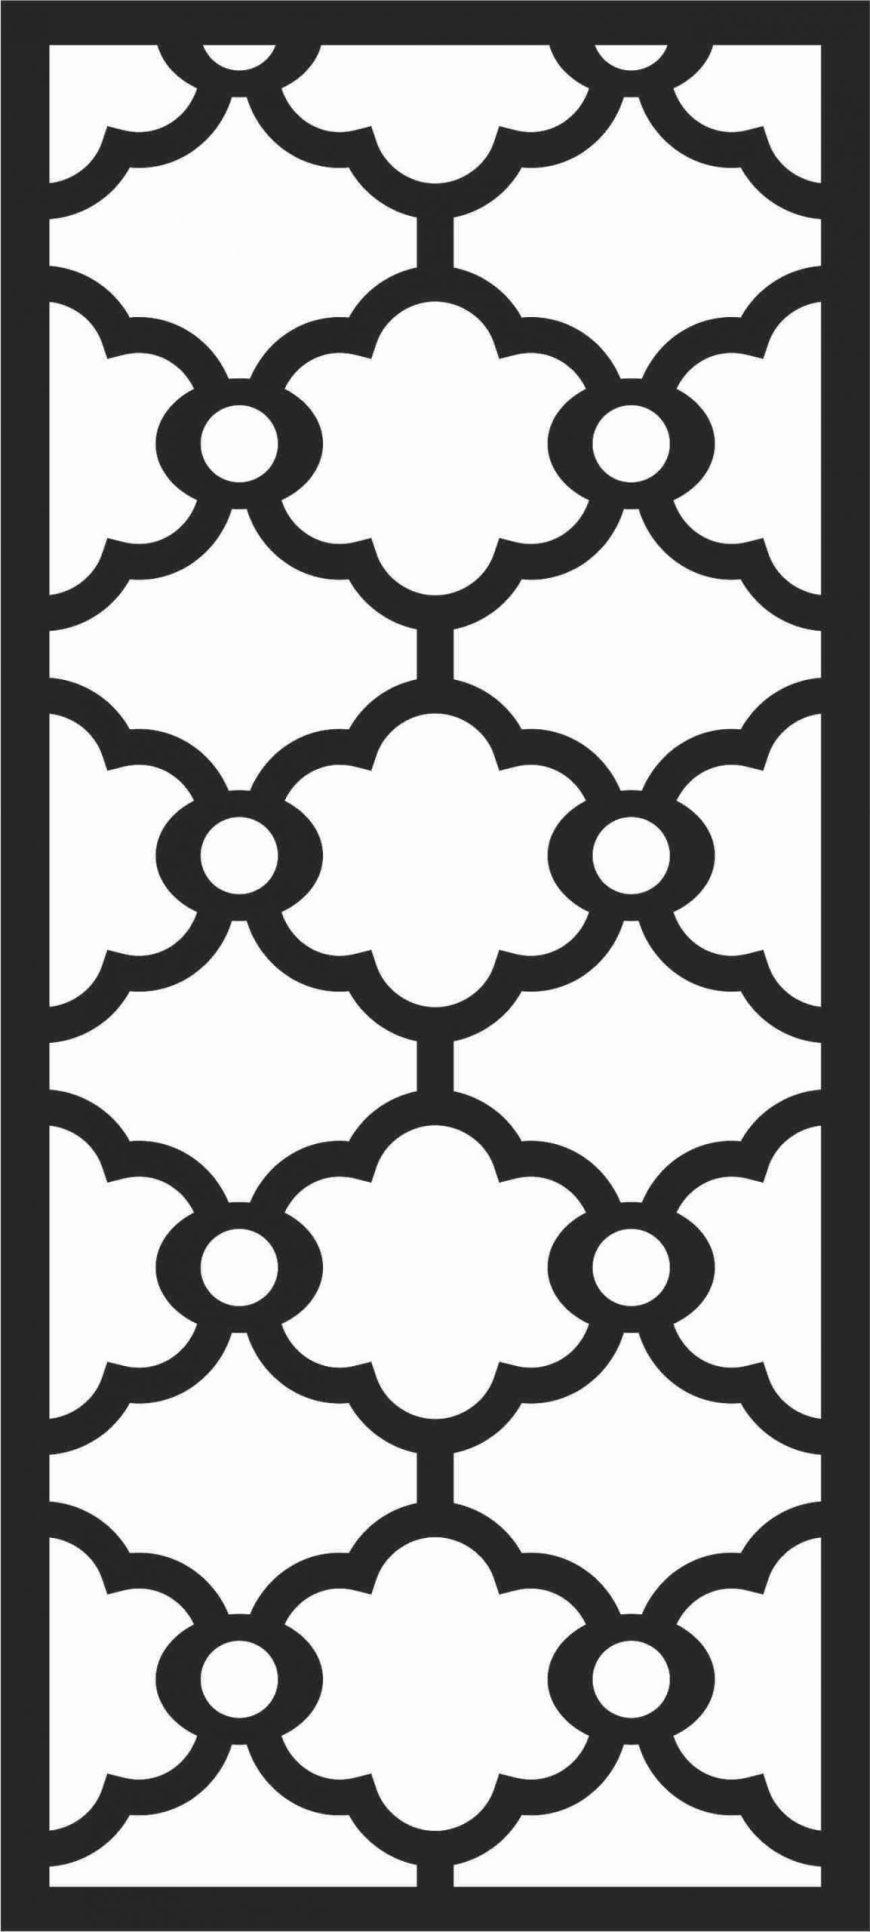 Screen Panel Patterns Seamless 81 Free DXF File